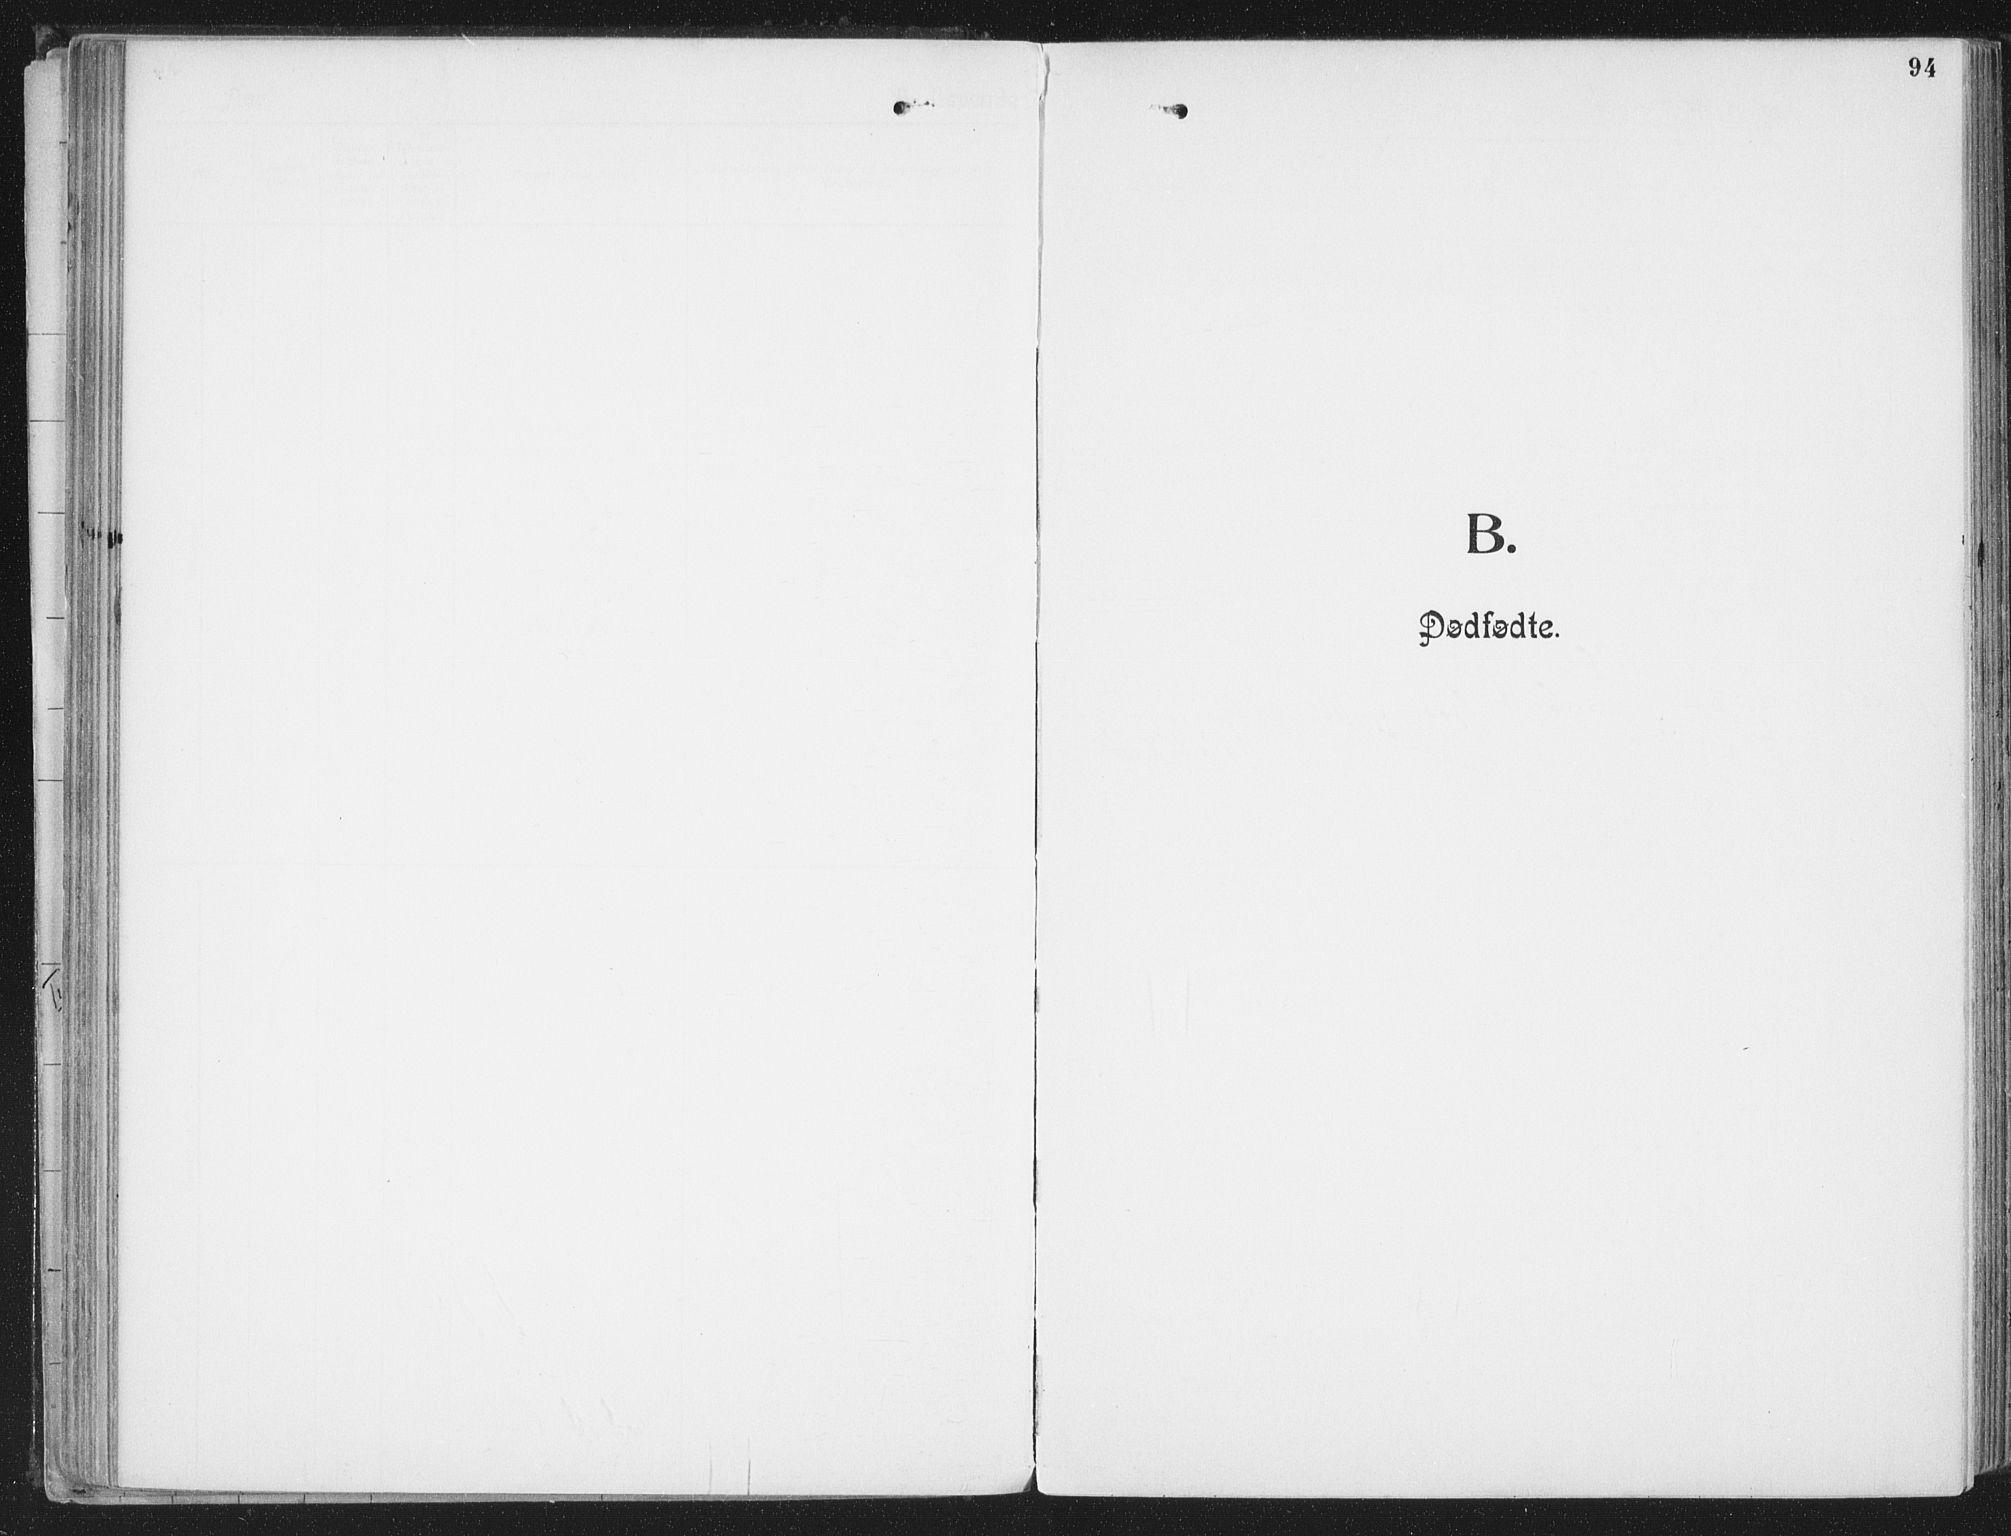 SAT, Ministerialprotokoller, klokkerbøker og fødselsregistre - Nordland, 804/L0081: Ministerialbok nr. 804A02, 1901-1915, s. 94